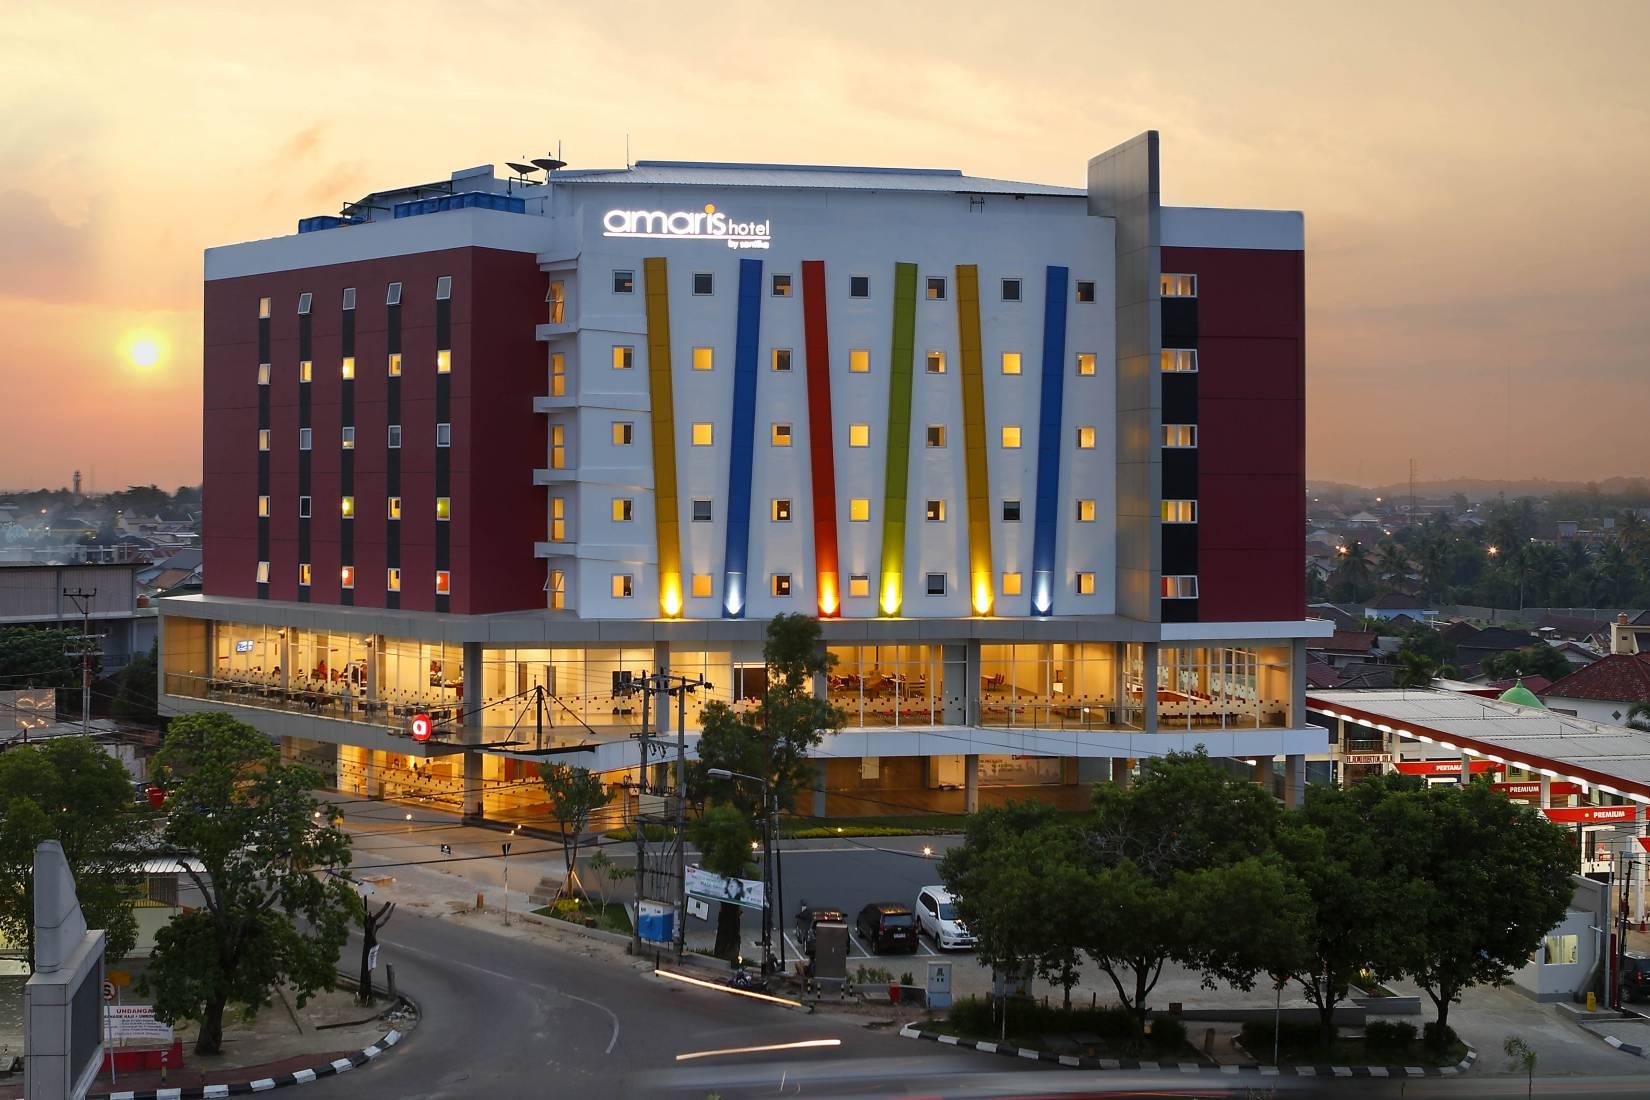 Amaris Hotel Palembang Official Amaris Hotel Website